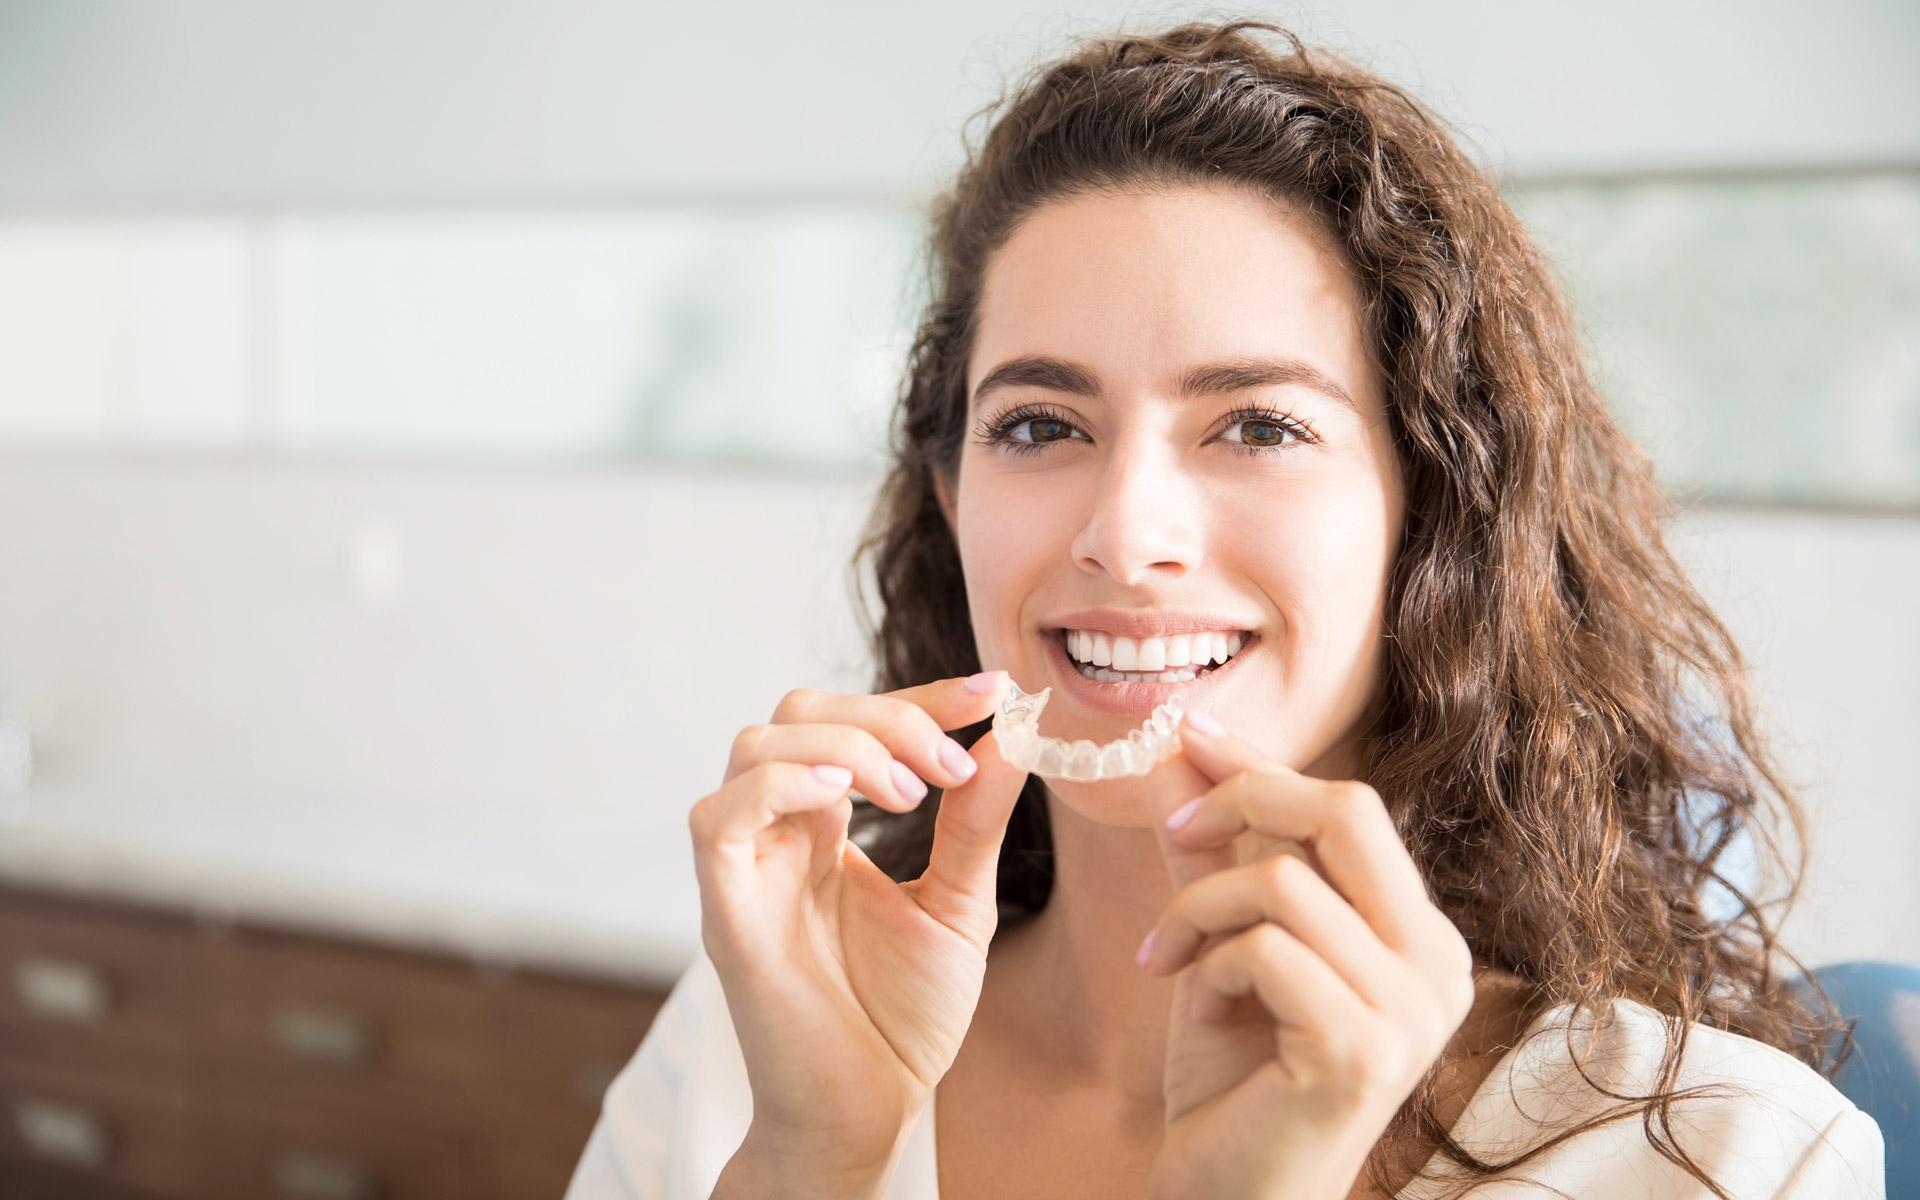 Alignertherapie bei Zahnarzt Schophaus nahe Maulburg